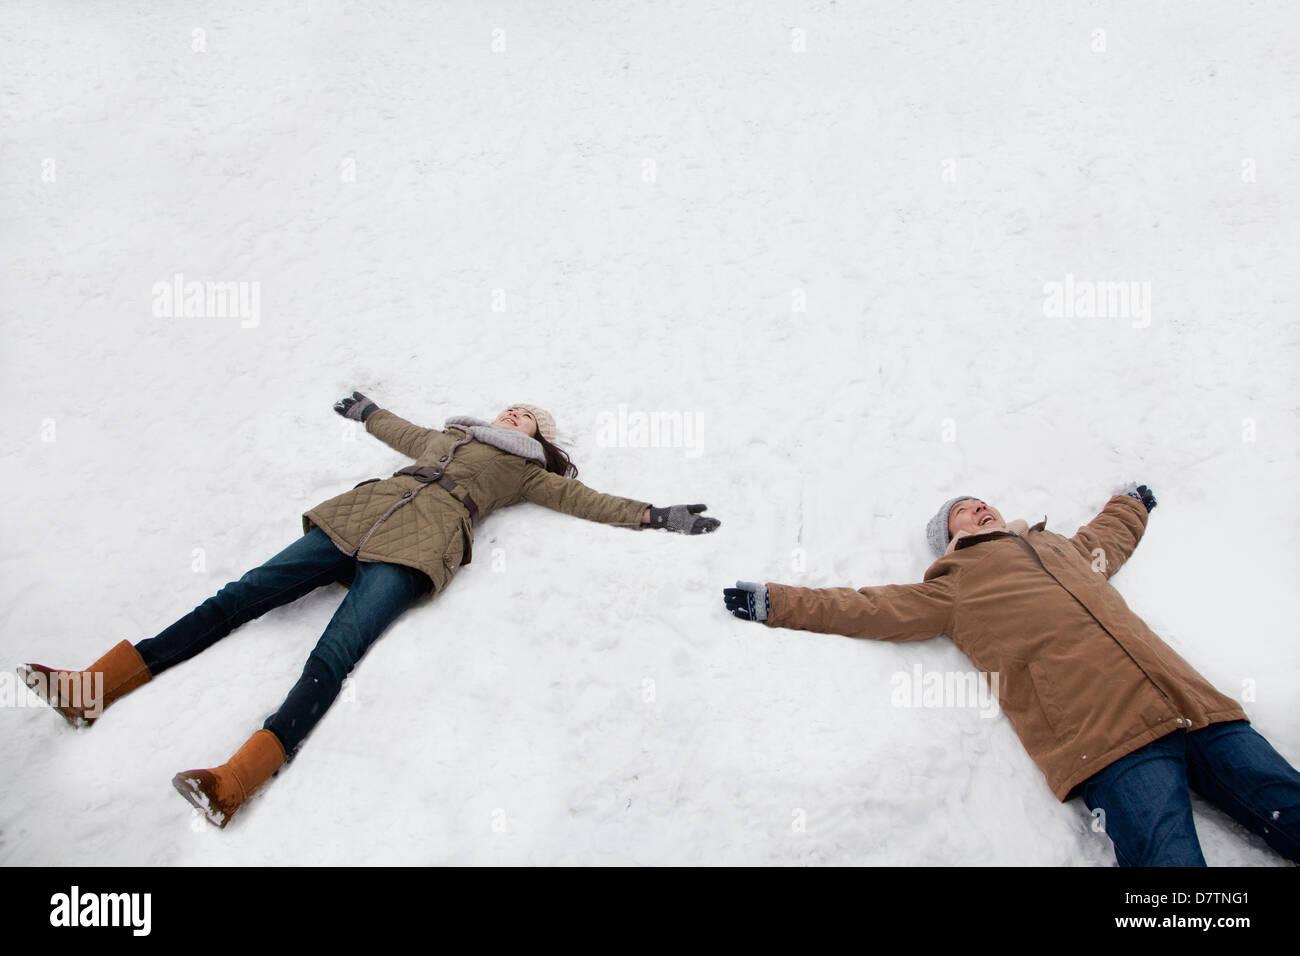 Pareja joven tendido en la nieve haciendo ángeles de nieve Imagen De Stock